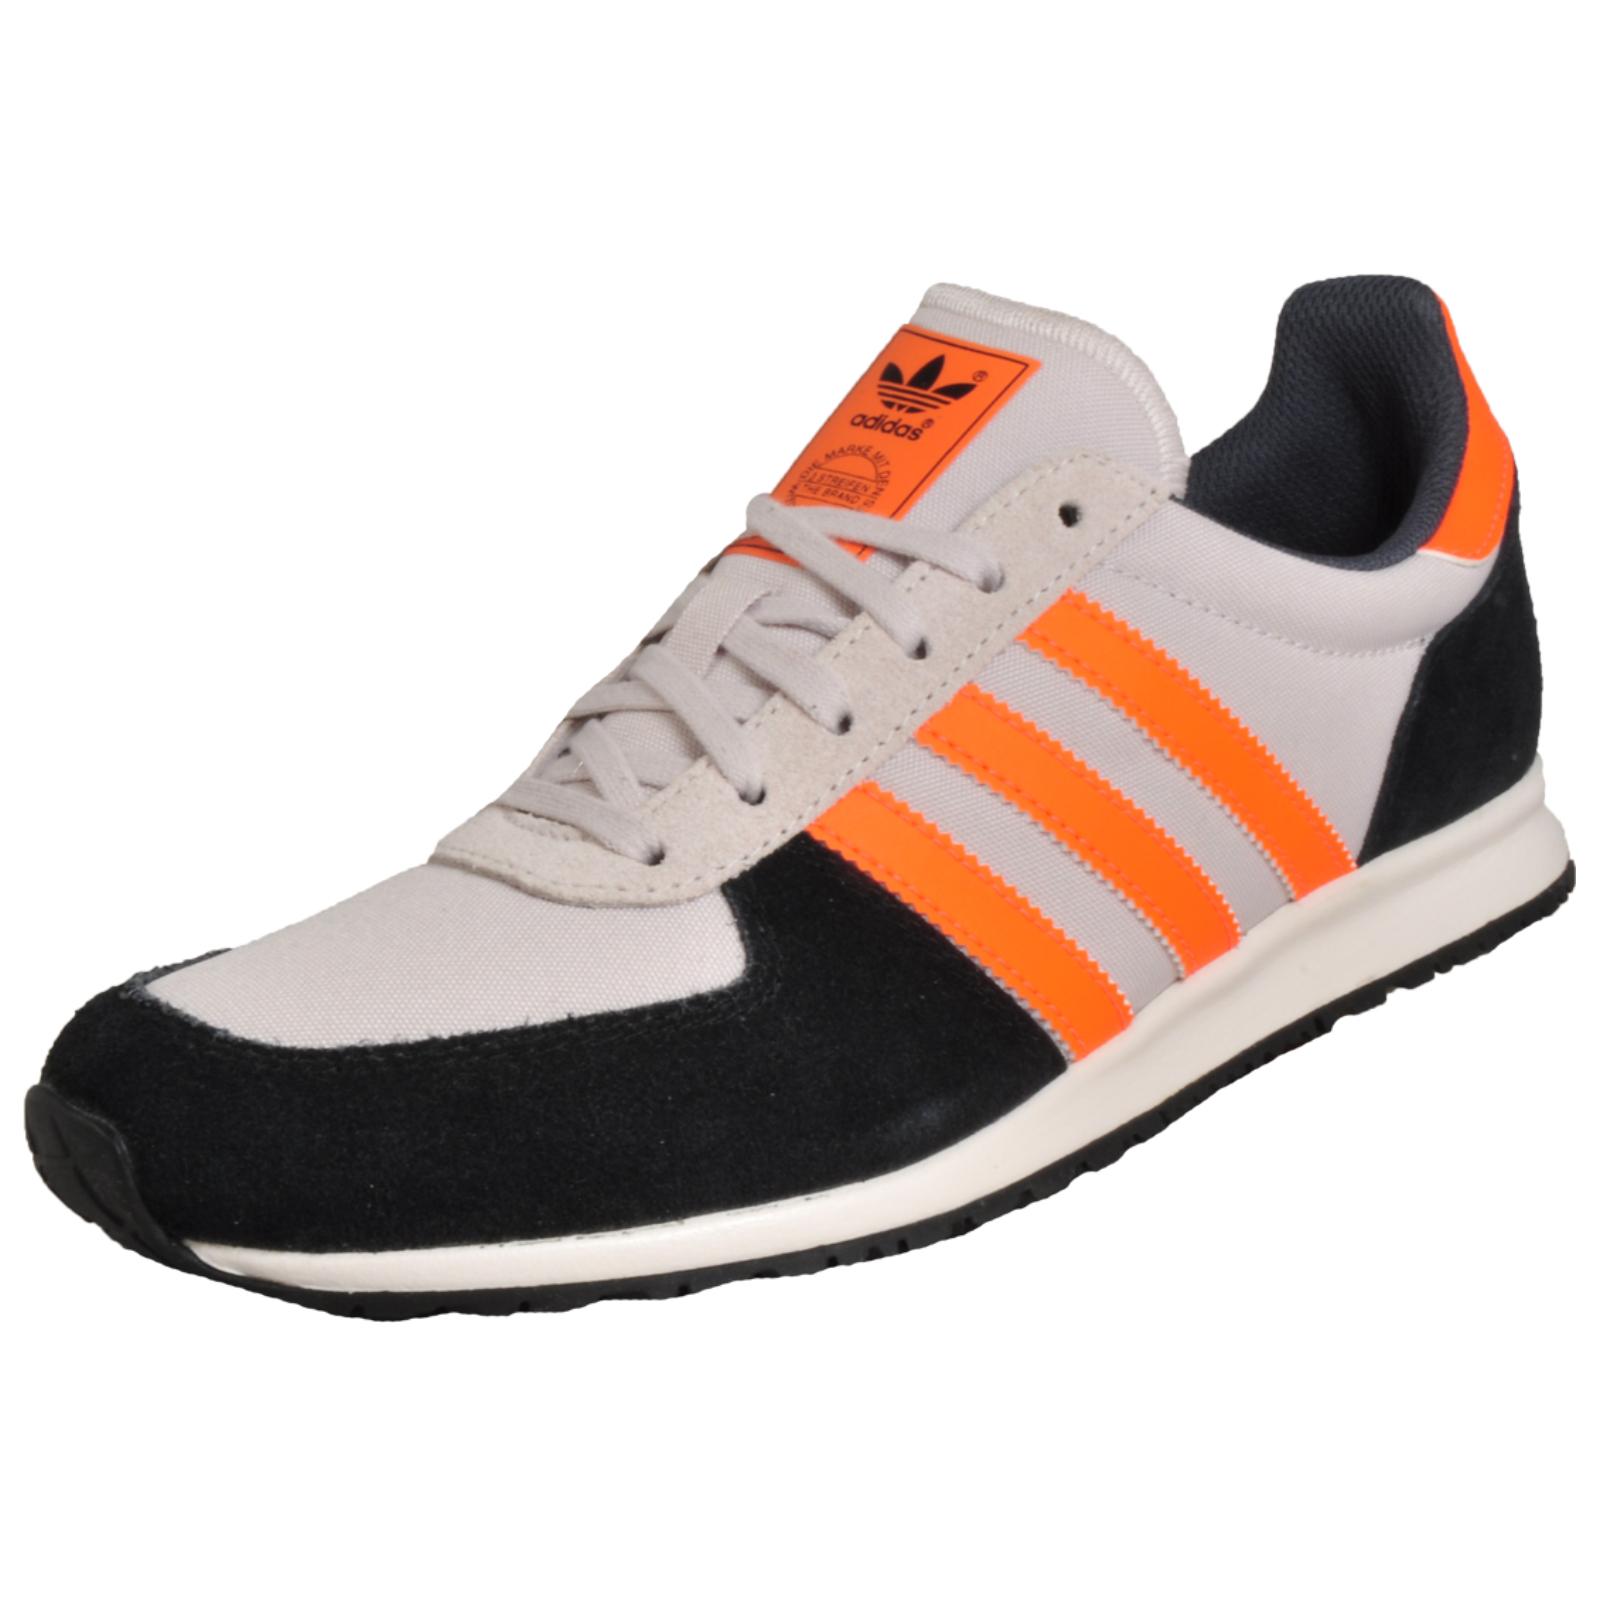 brand new 9ceb6 39d58 Adidas Originals Adistar Racer Classic Casual Retro Trainers Sneakers